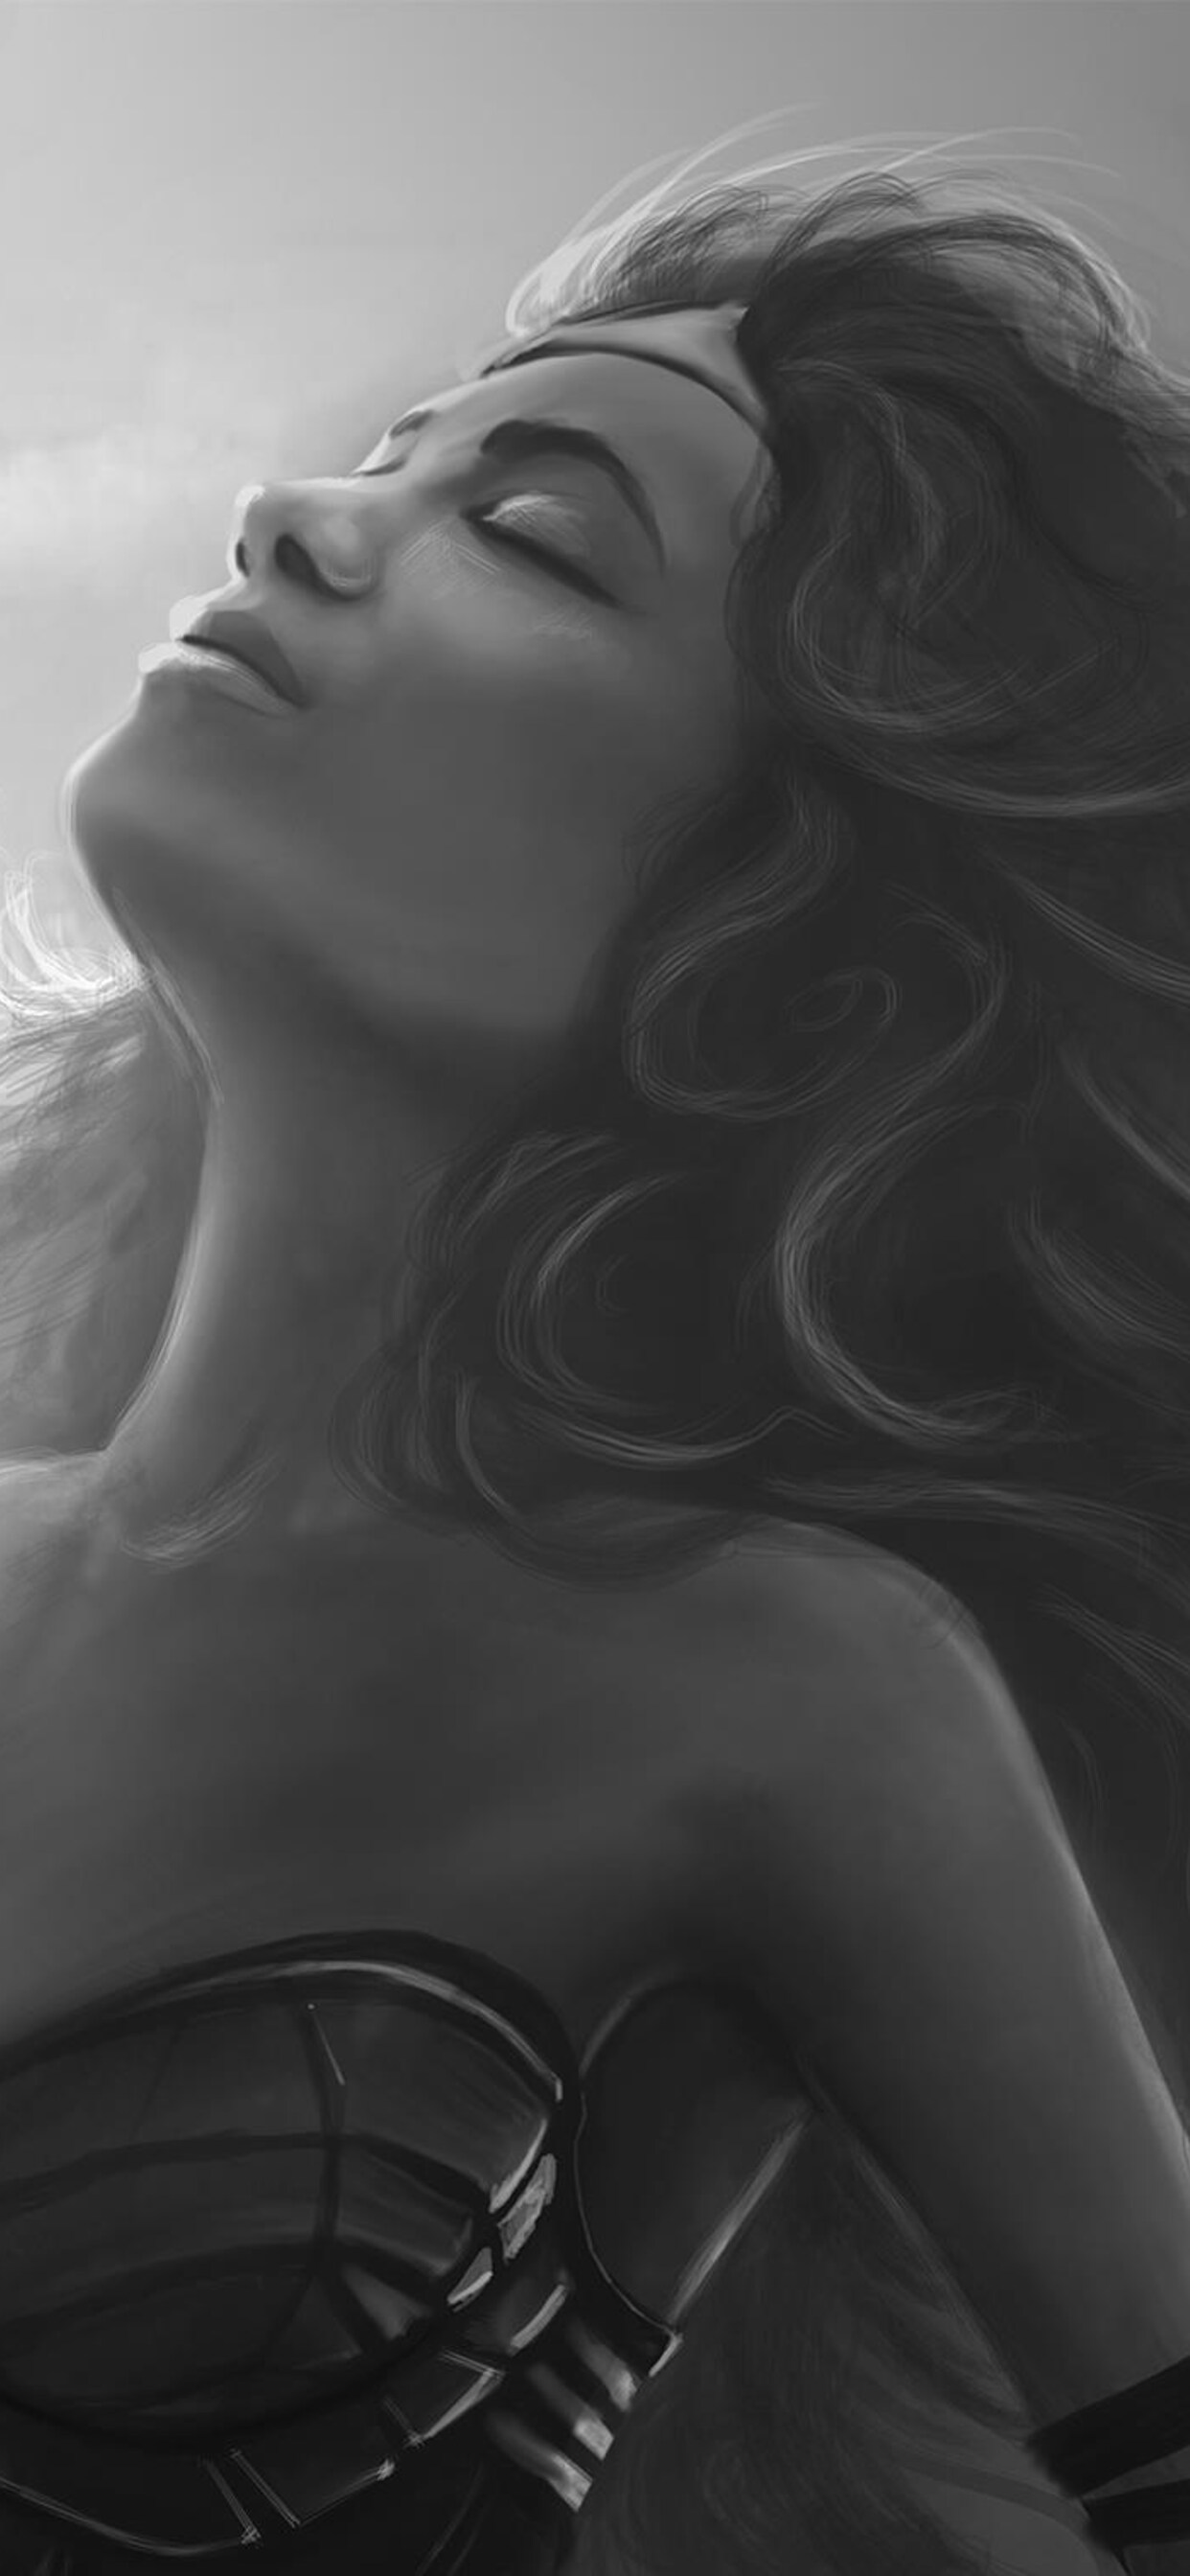 wonder-woman-art-2-img.jpg